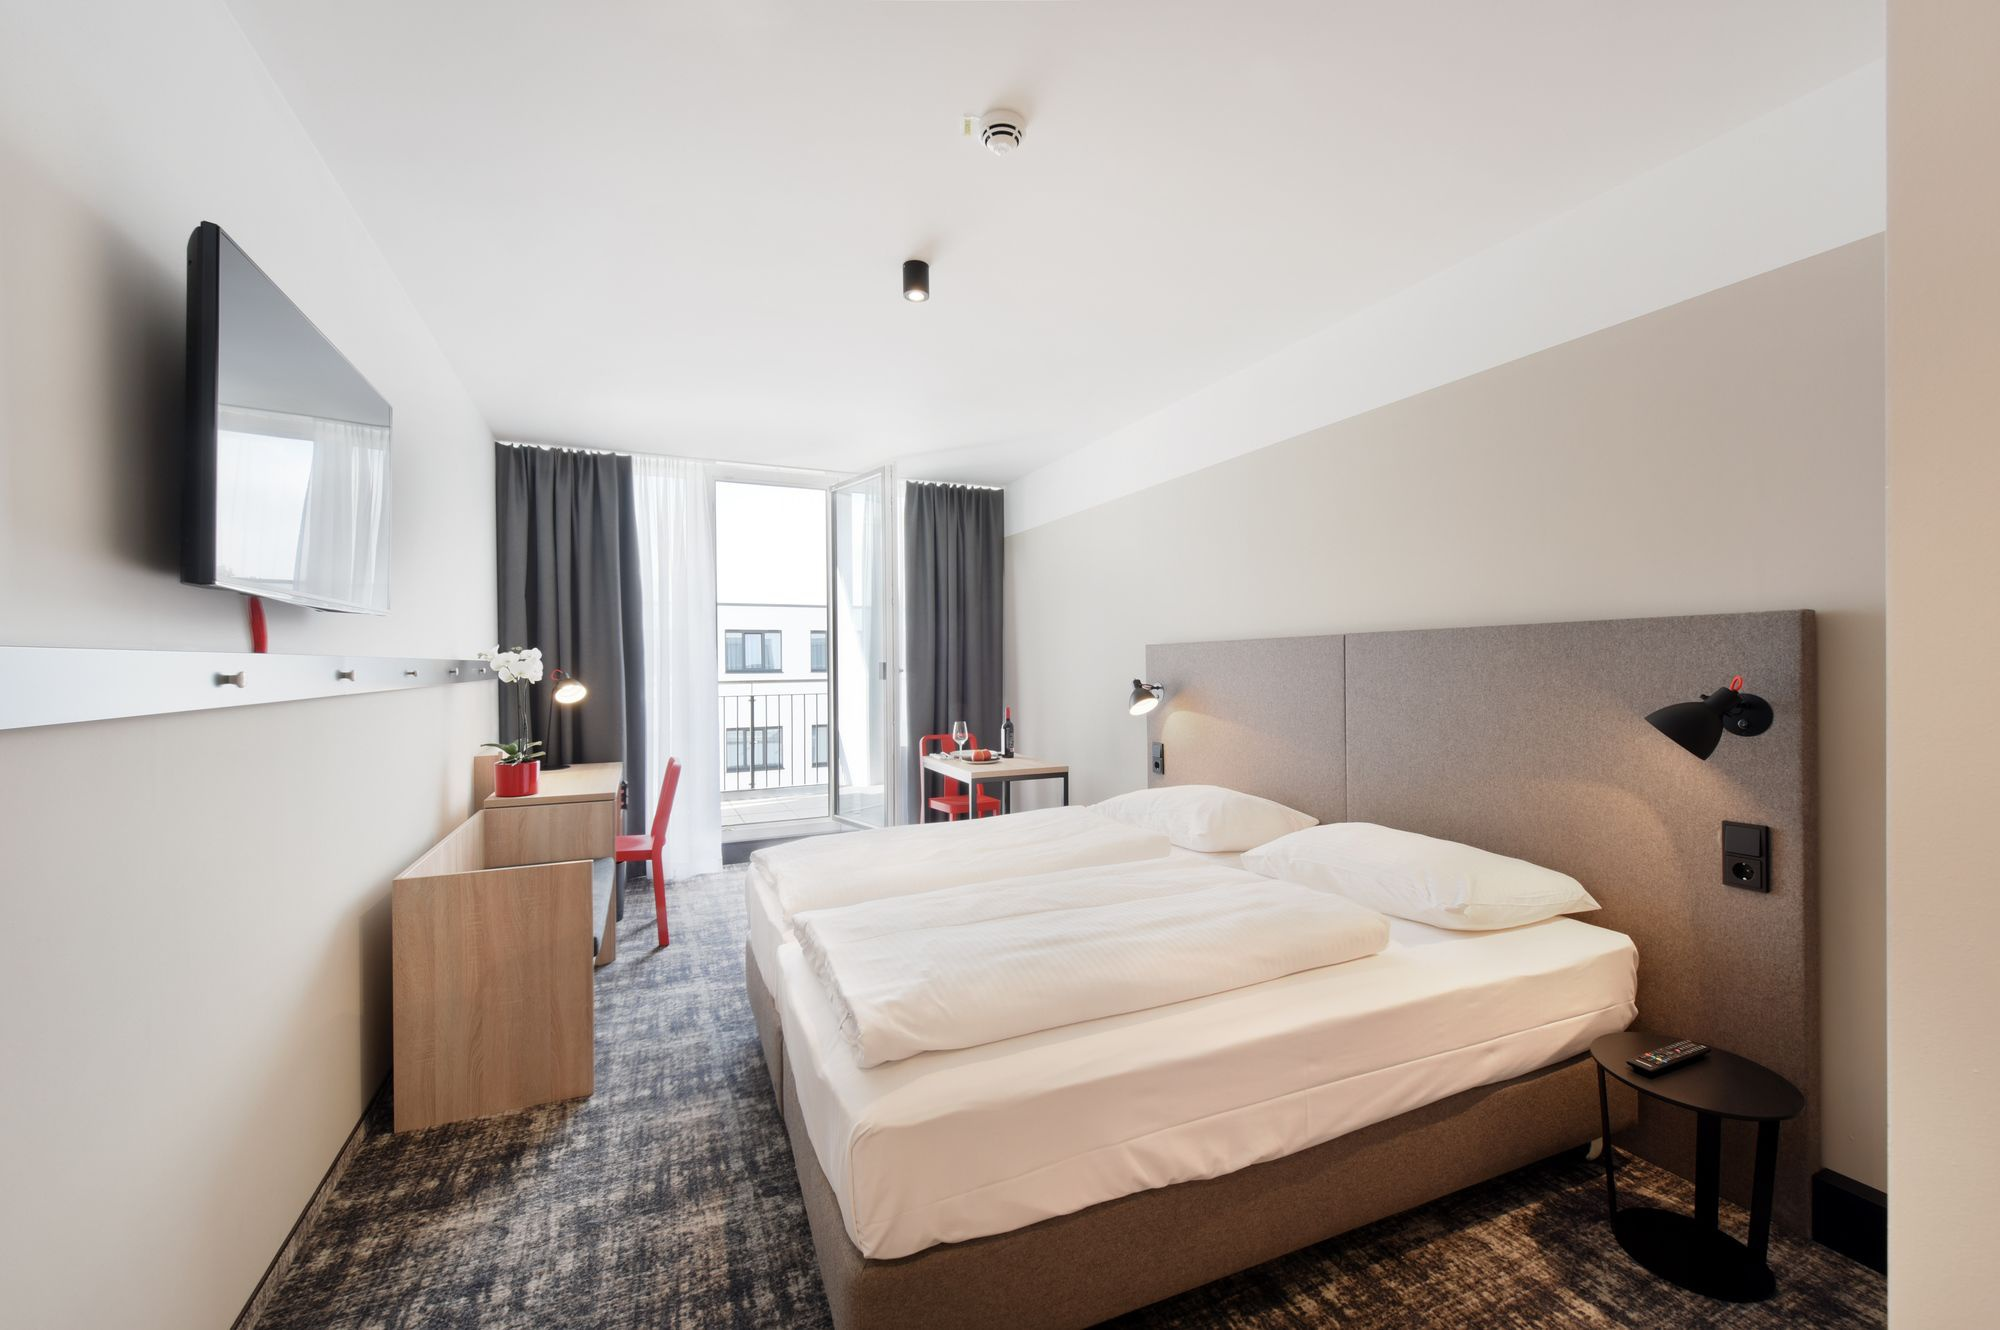 The Centerroom Hotel&Apartments München.Messe